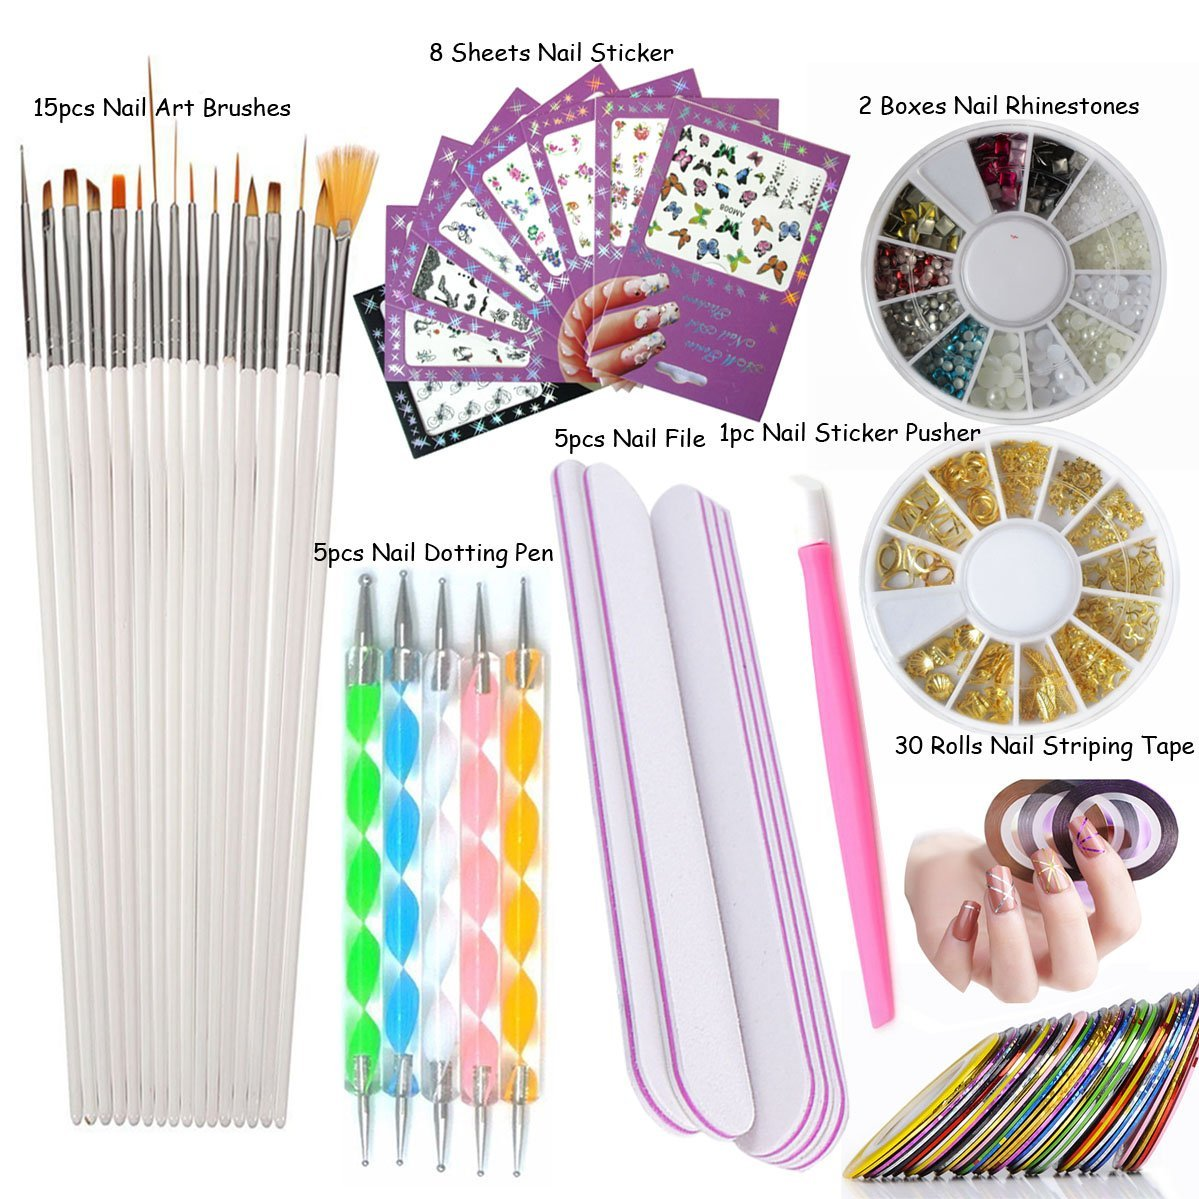 26pcs/set Nail Polish Stencil Toe Separators Varnish Protector Holder Finger Nail Art Design Tips Cover Shield Manicure Tools + Sticker (LOH103SET) LoveOurHome